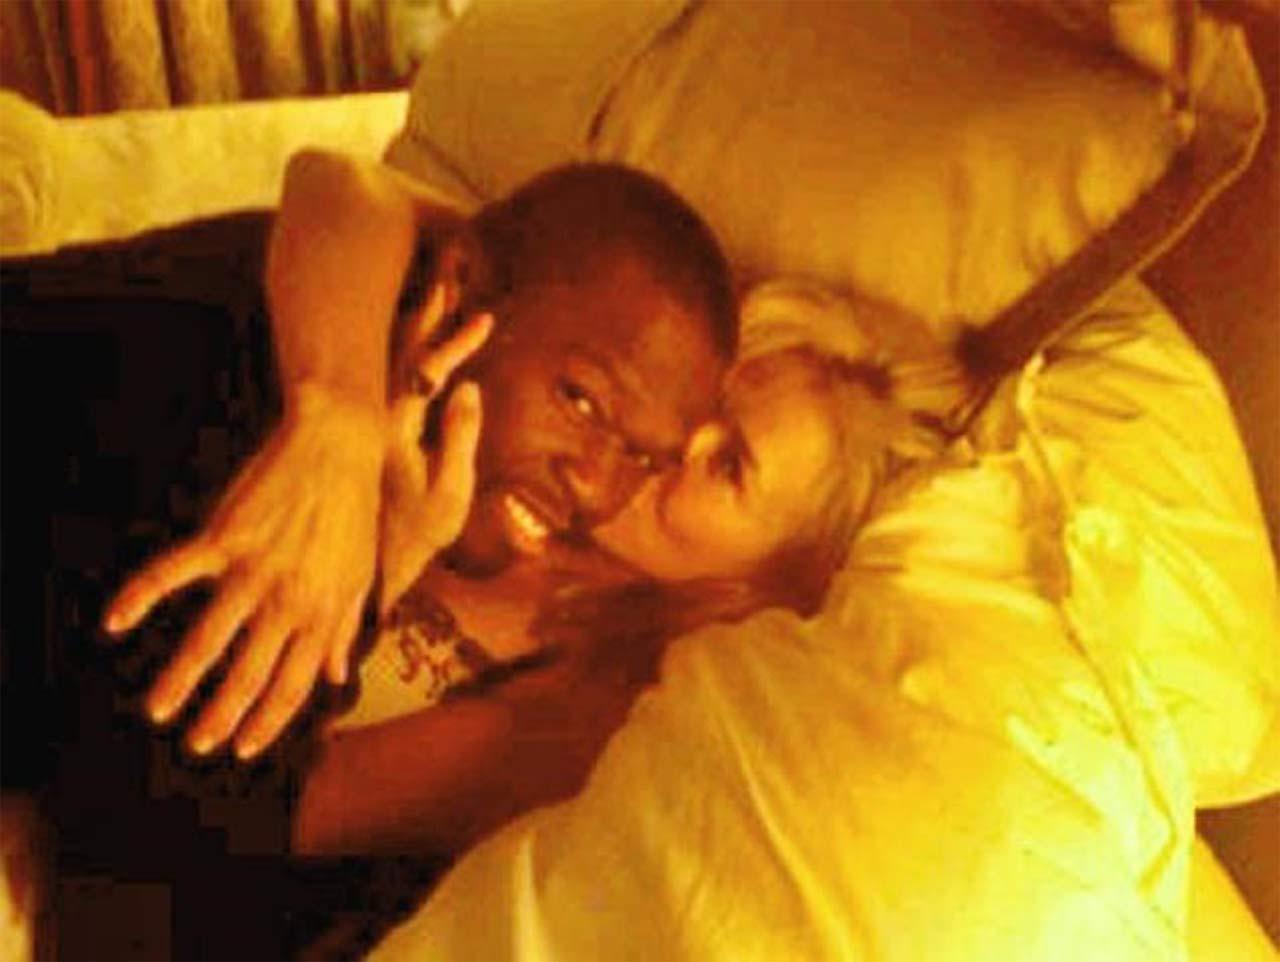 Chelsea Handlers Sex Tape photo 7